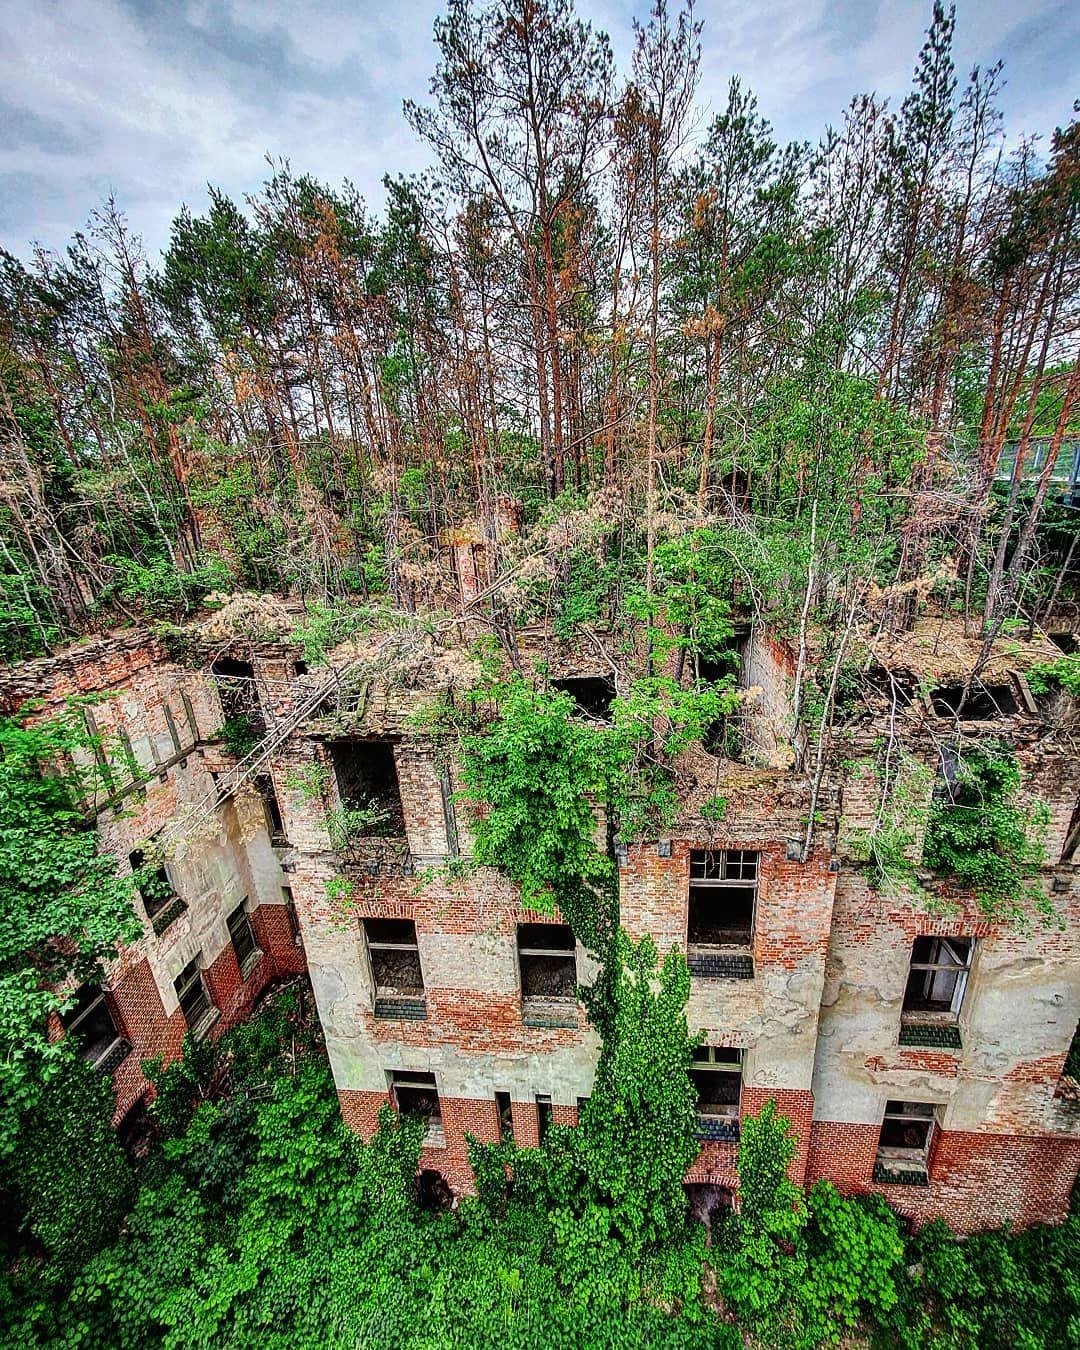 Lostplace Abandonedplaces Abandoned Nature